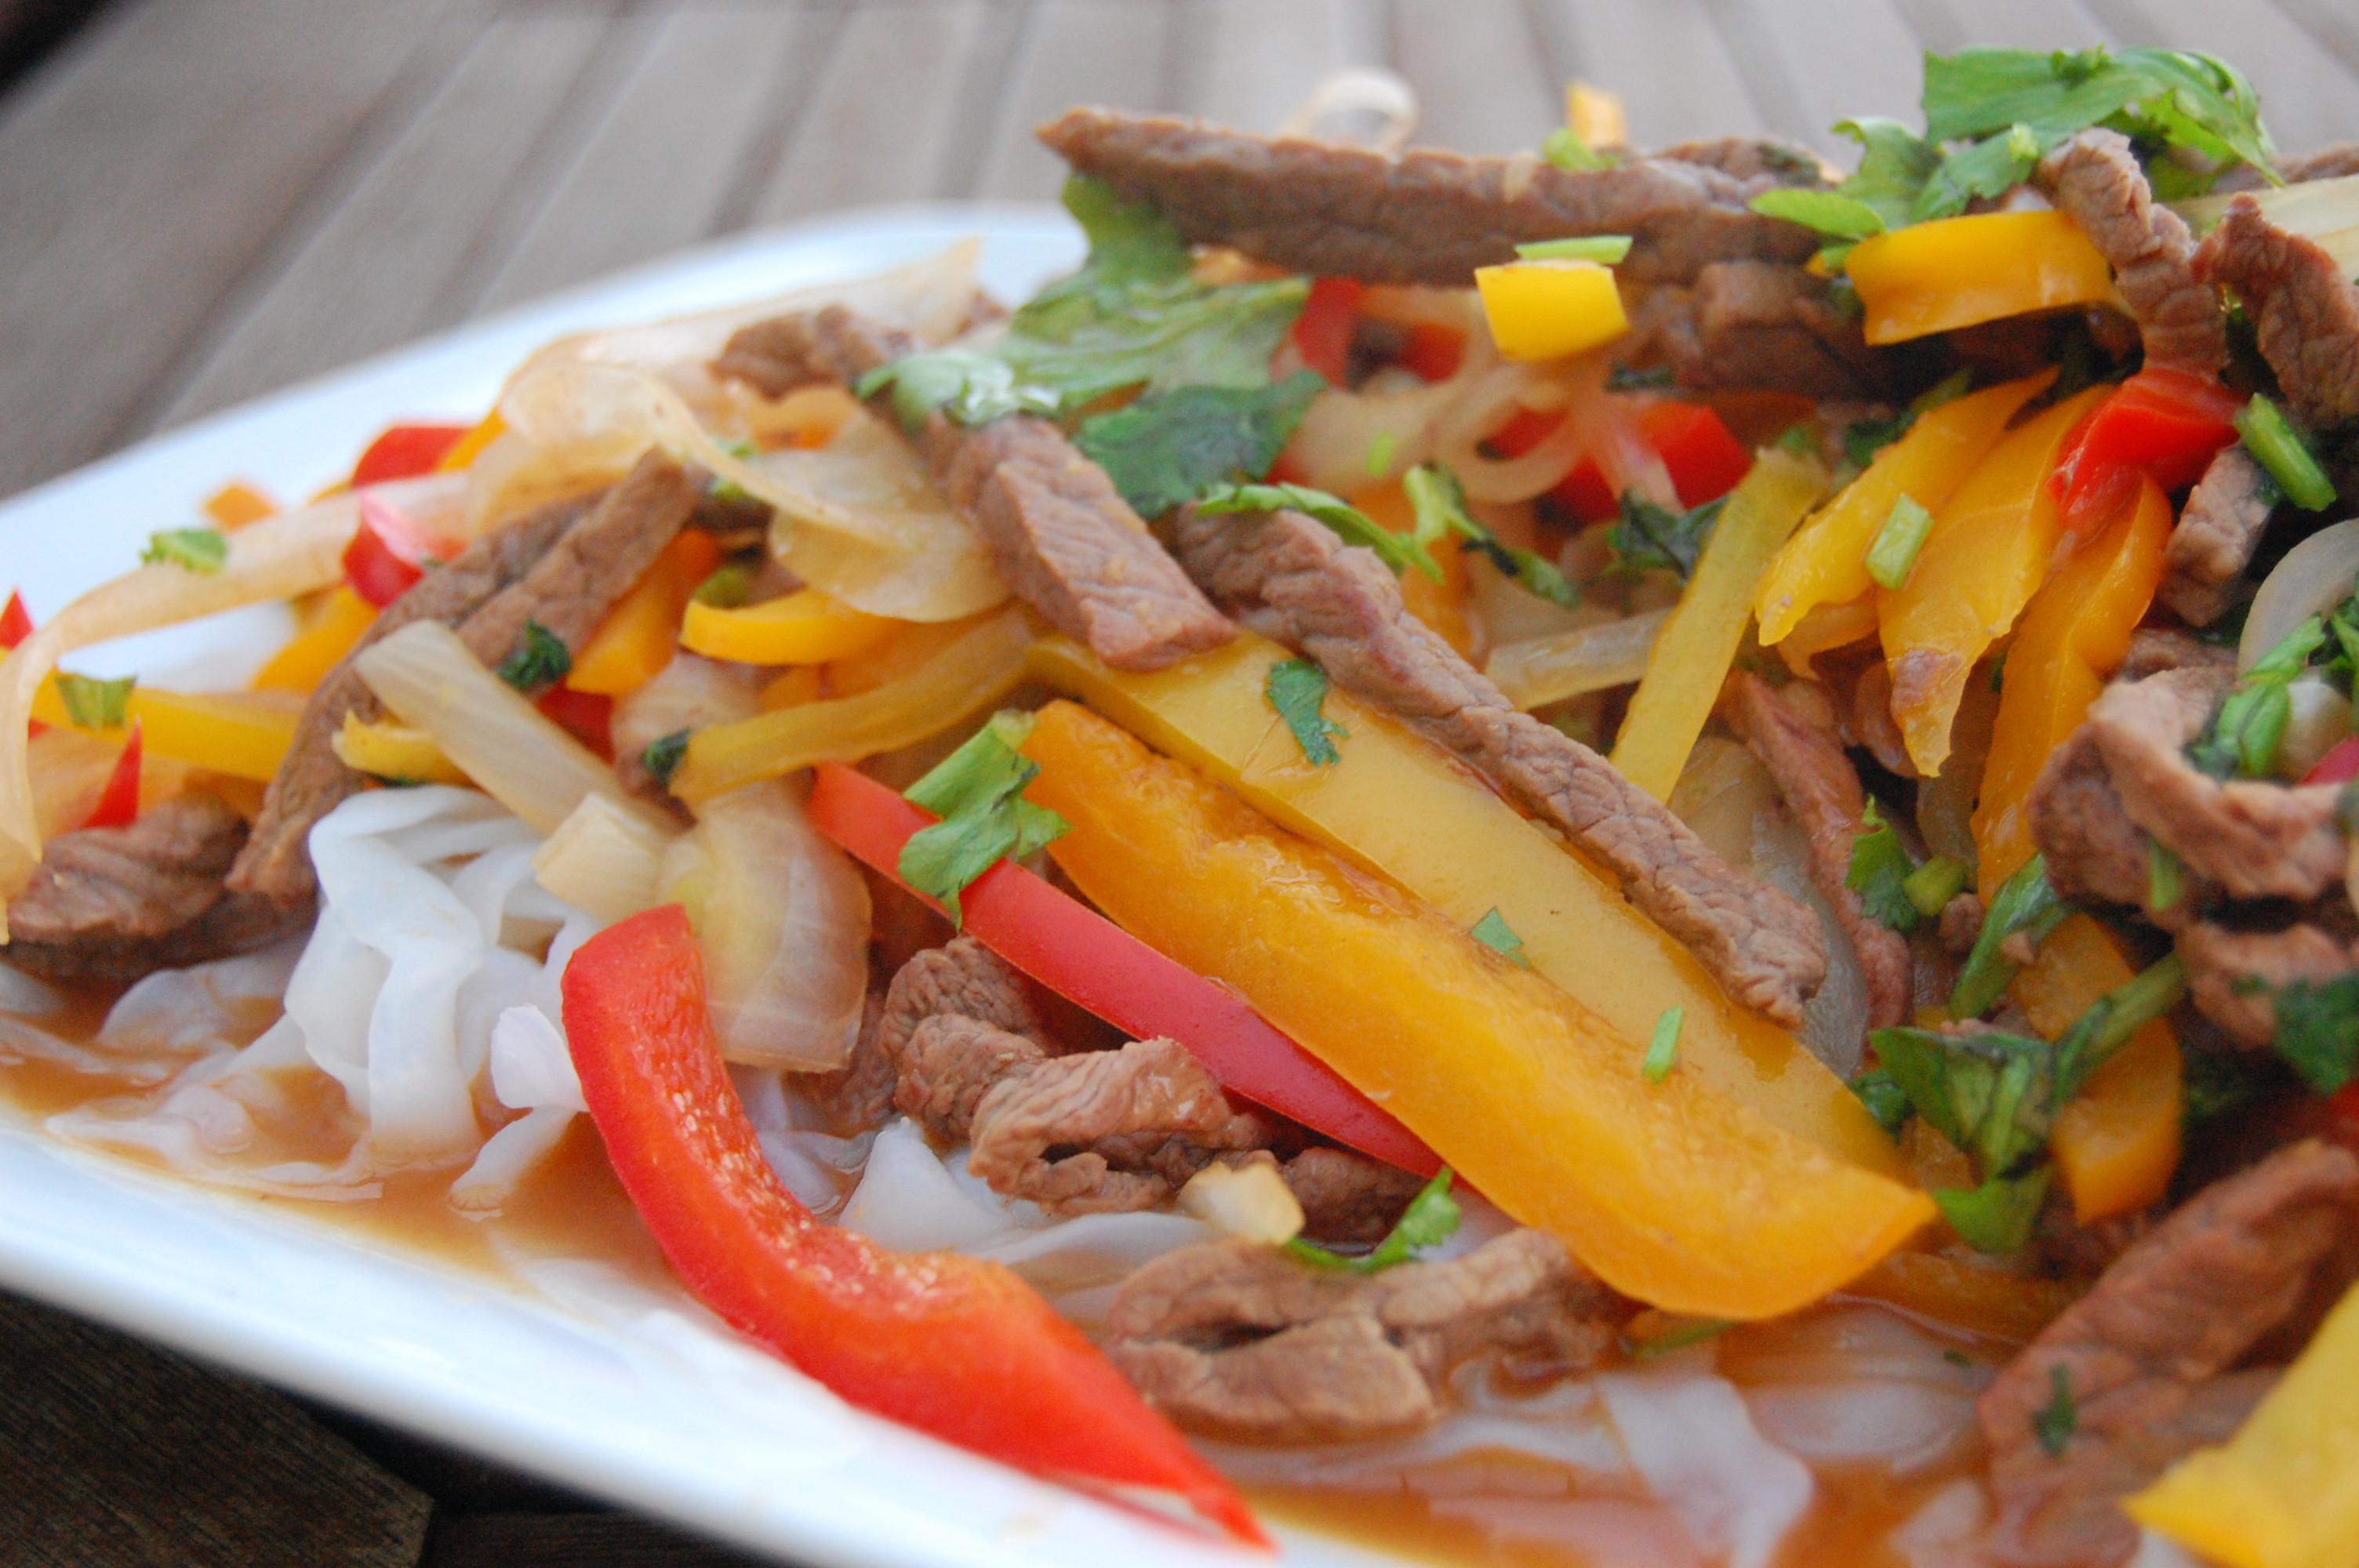 Stir-fry of Sirloin with Shirataki Noodles